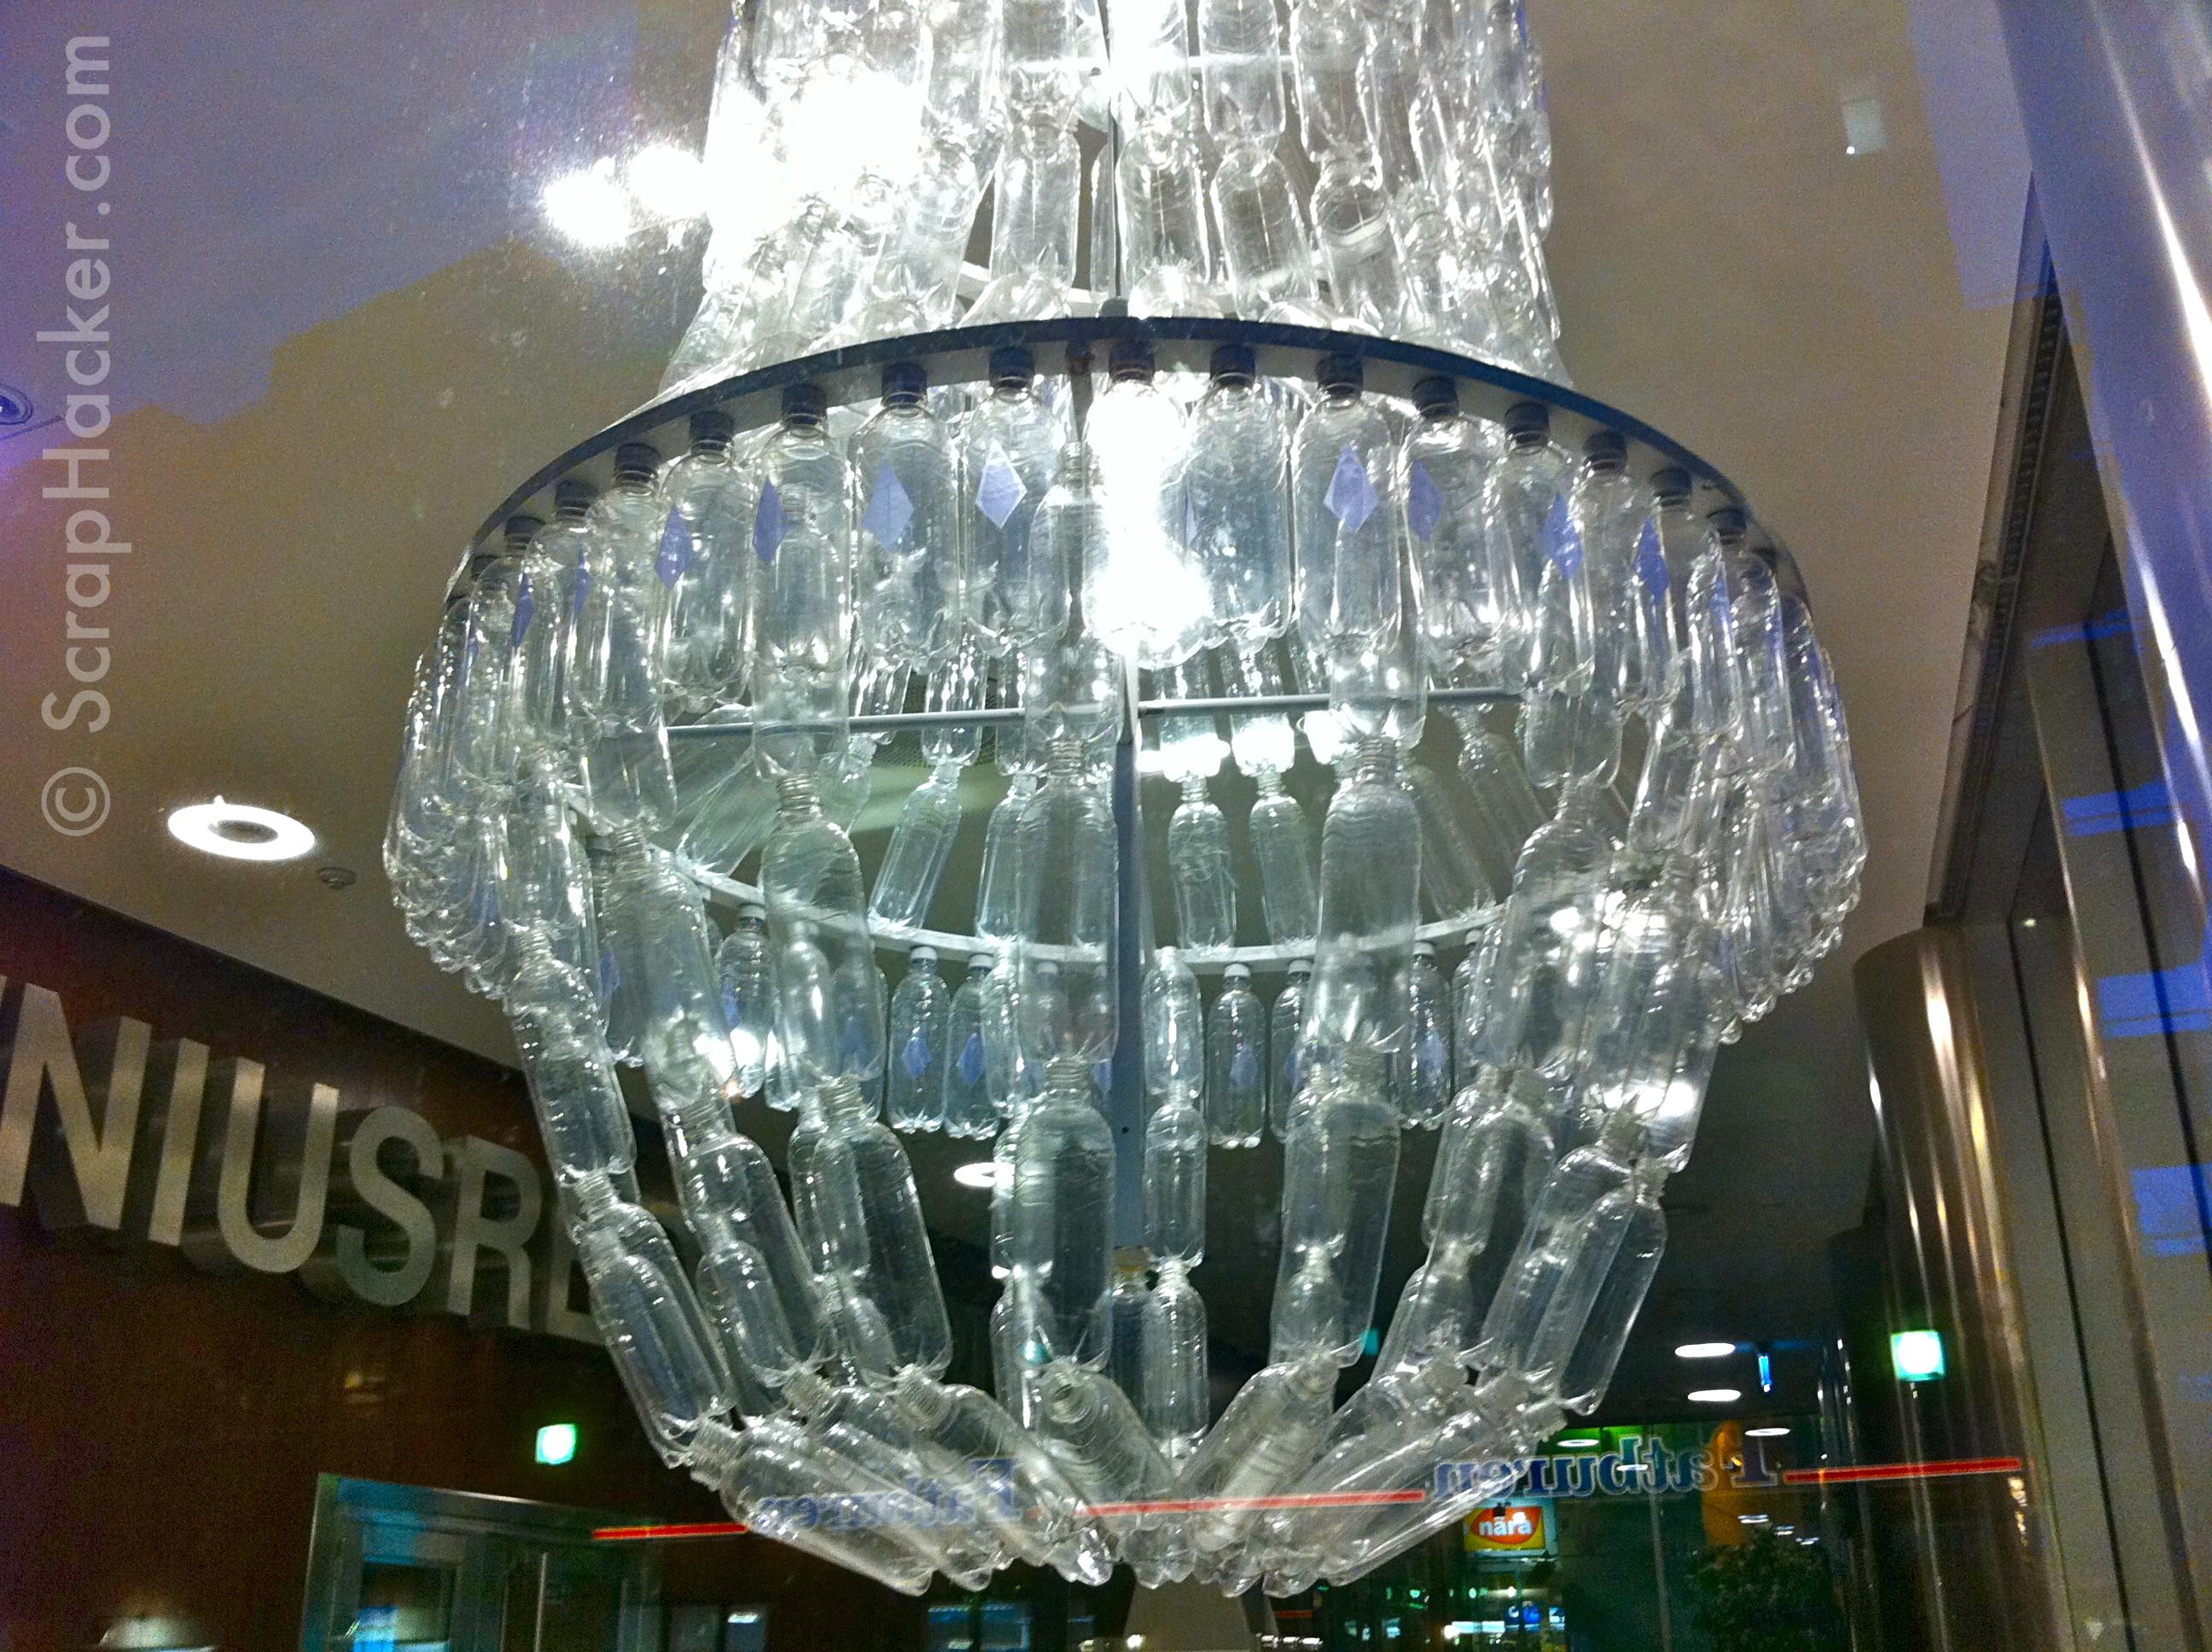 Genius in a bottle the amazing plastic bottle chandelier share aloadofball Choice Image